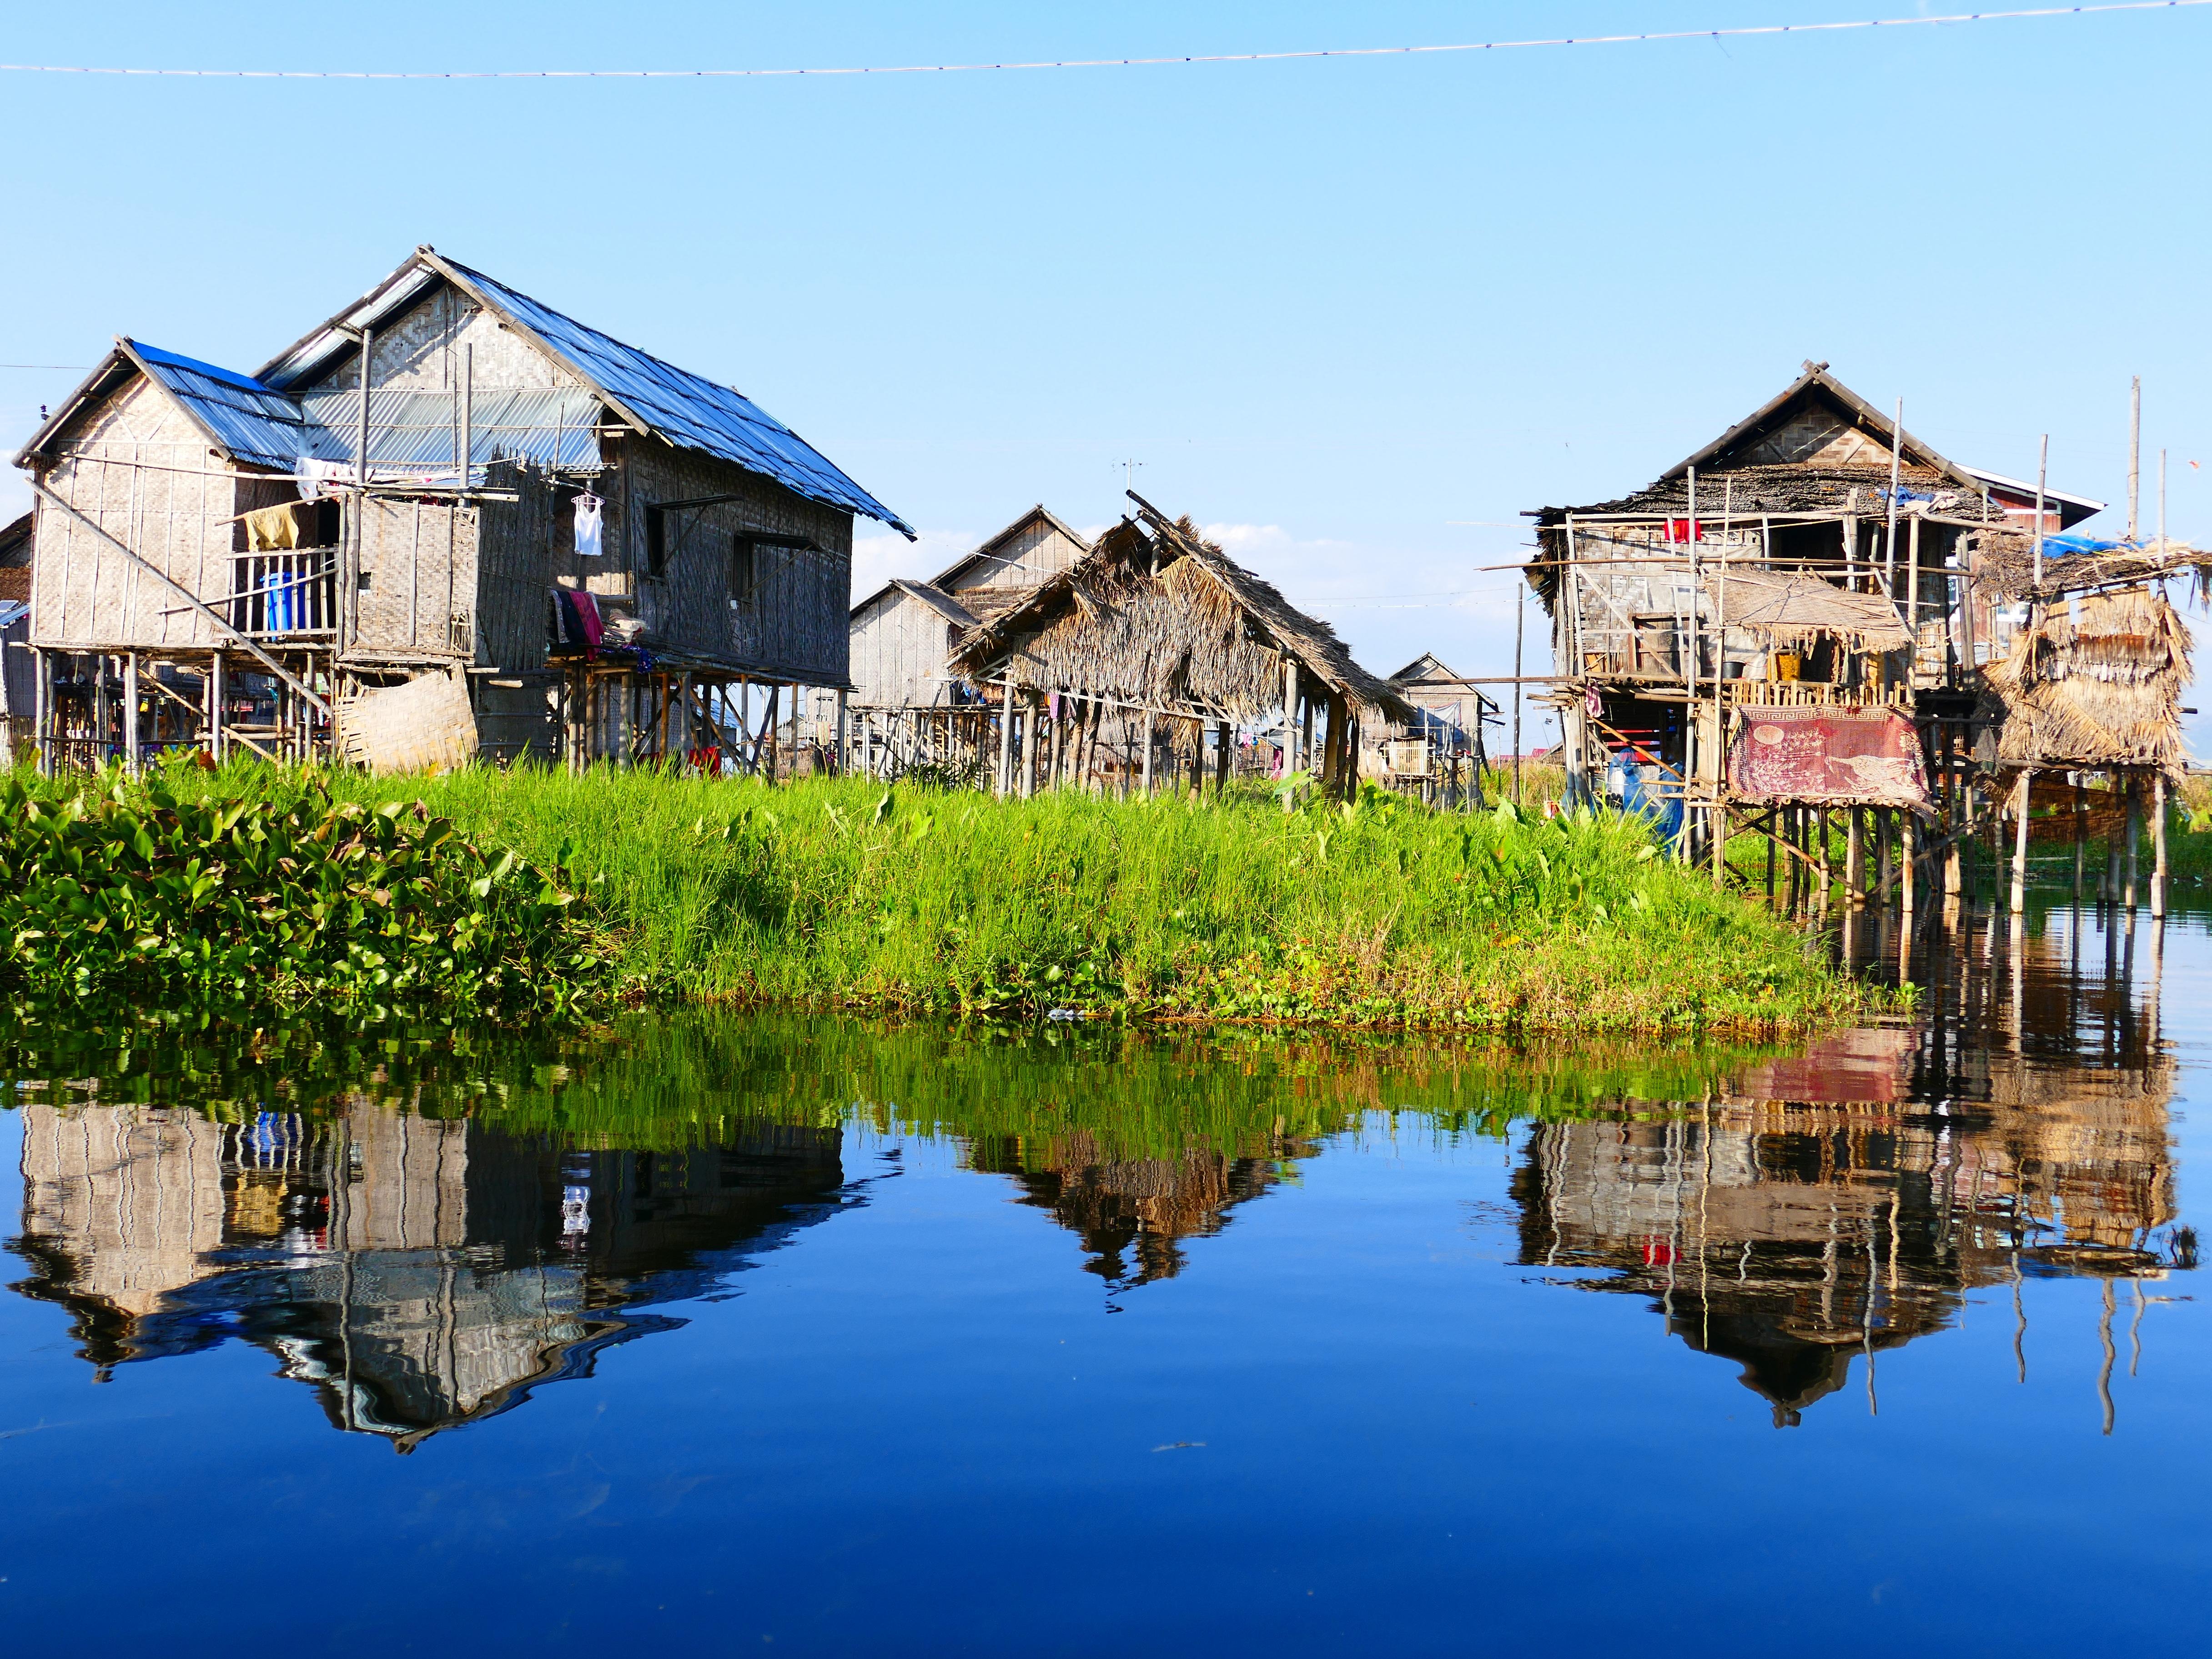 vacaciones choza reflexin camino acutico tallo aguas myanmar birmania rea rural insee palafitas casa sobre pilotes casa sobre pilotes